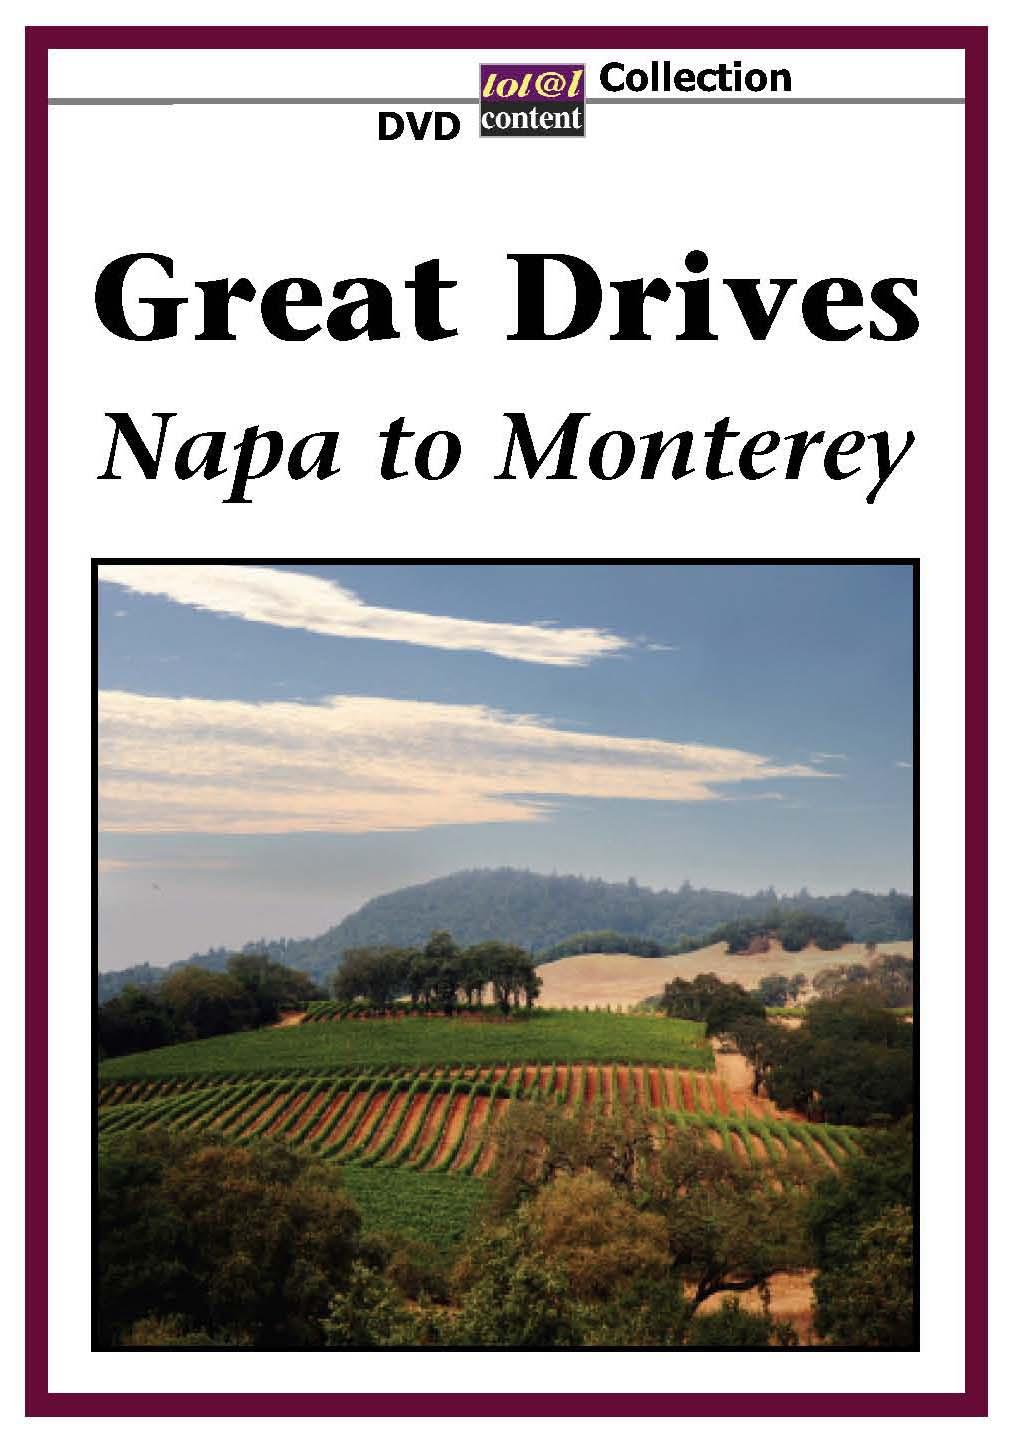 Great Drives: Napa to Monterey